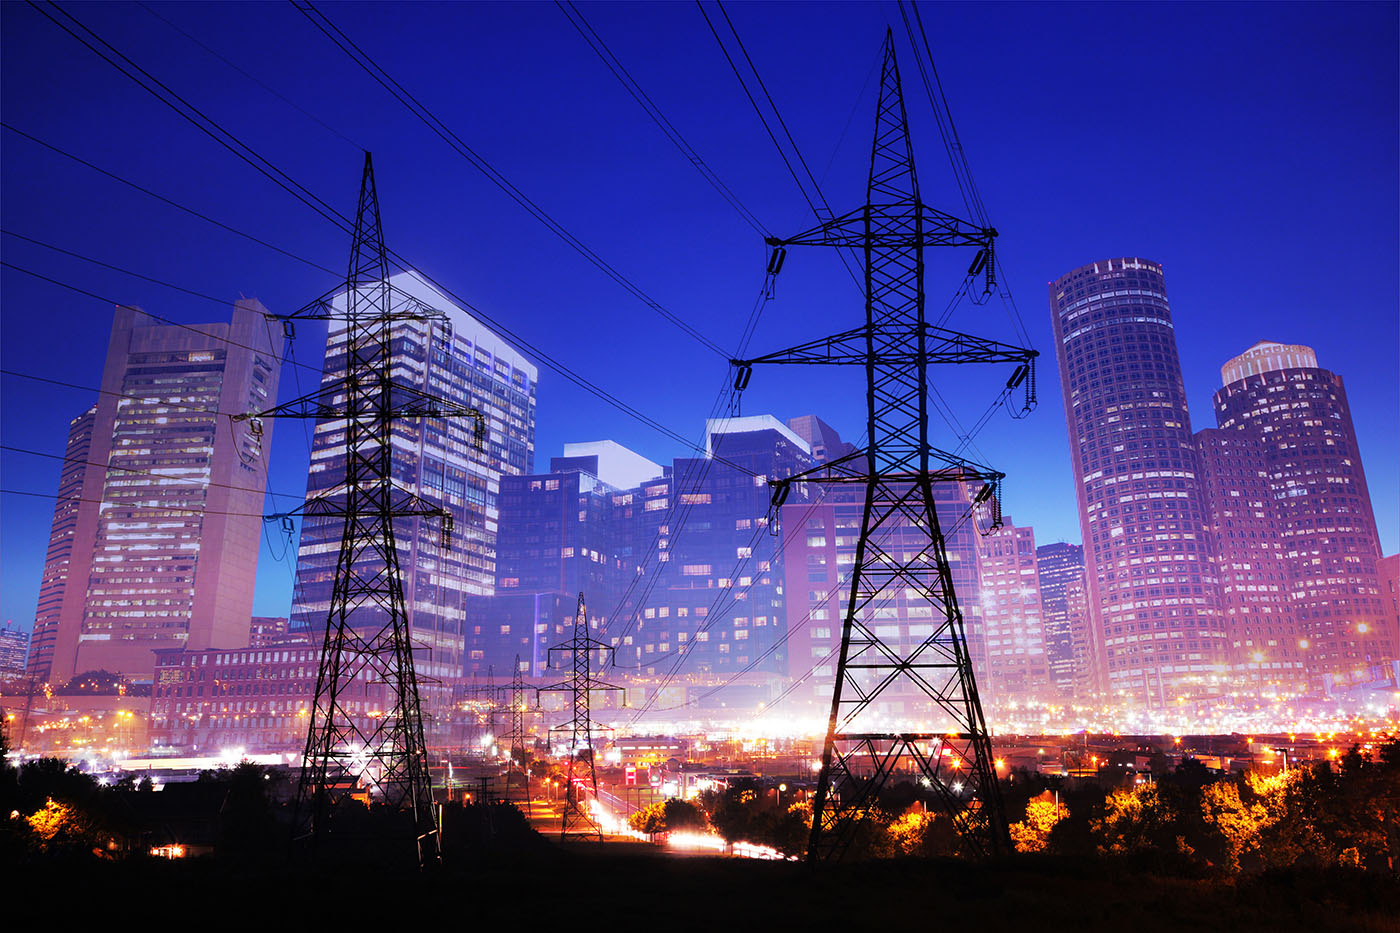 Urban Energy 2 - Royalty-Free Stock Imagery